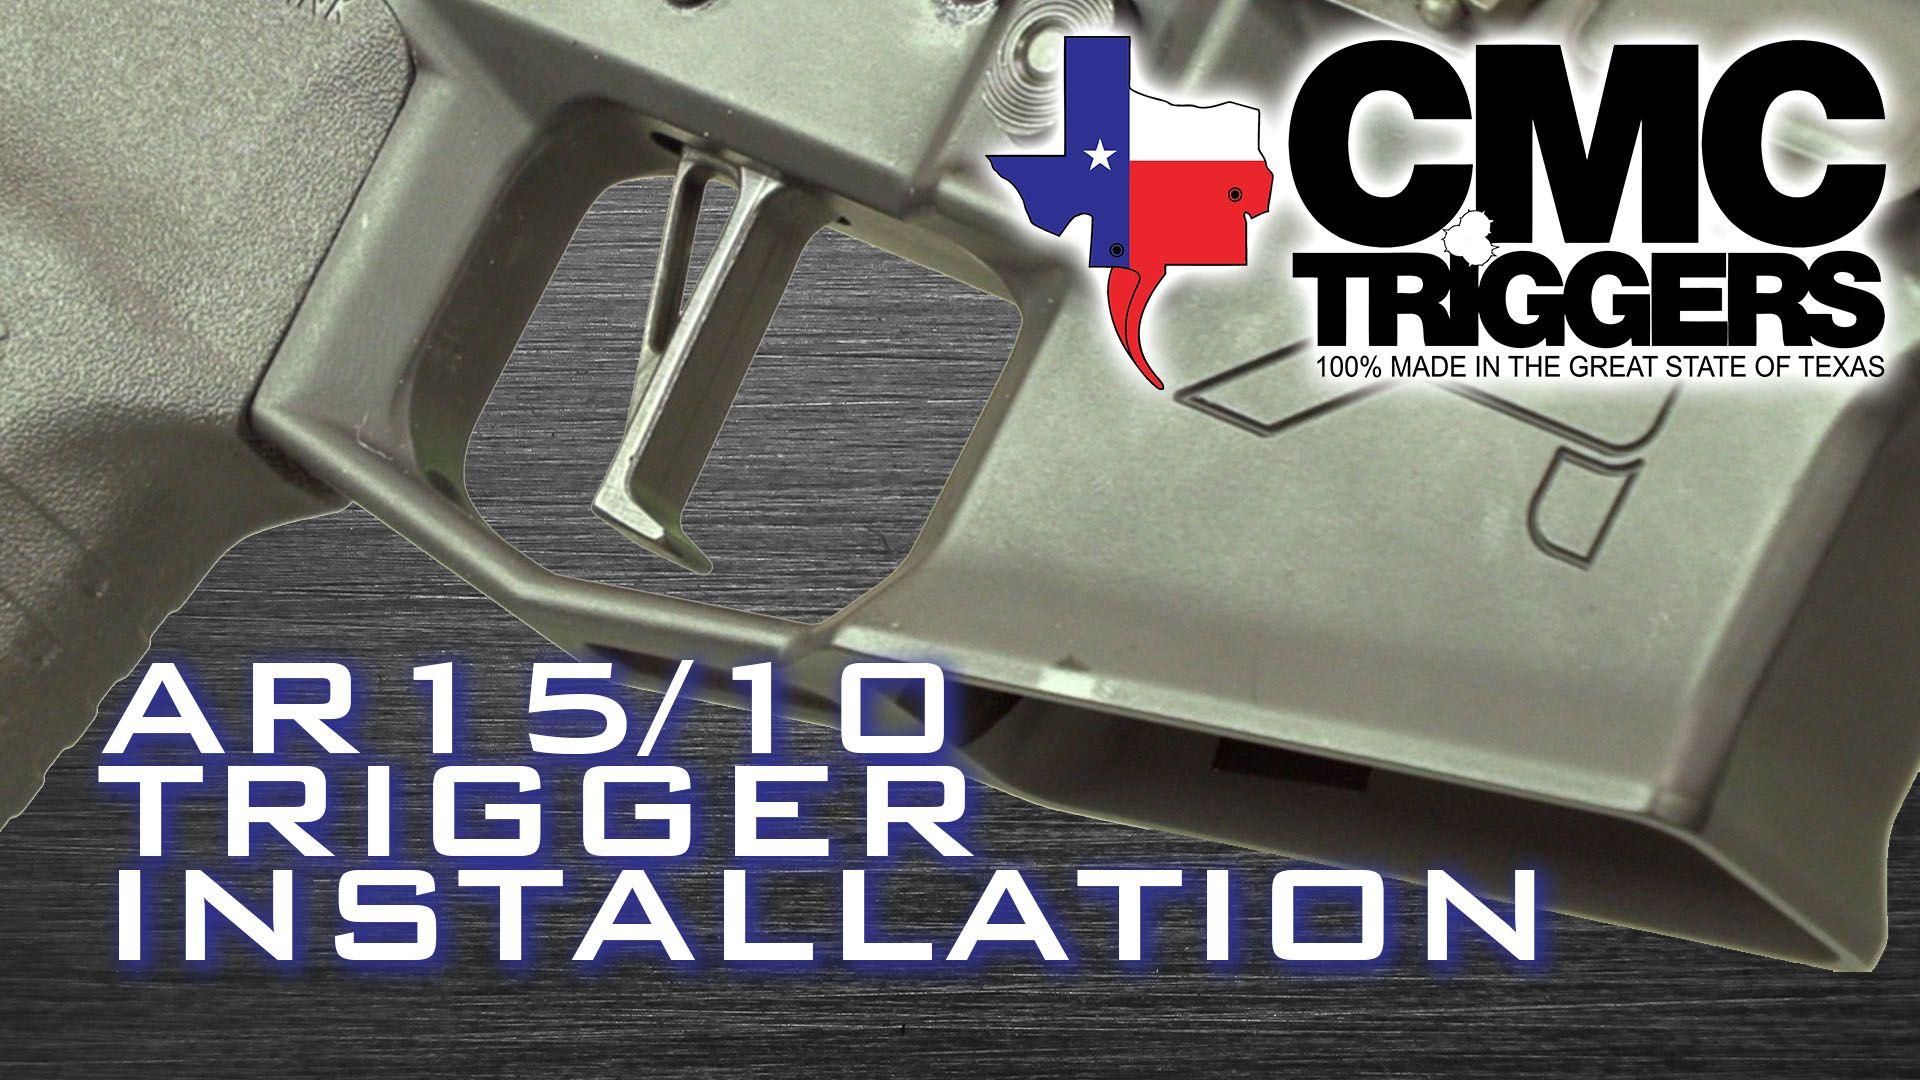 opplanet cmc triggers ar trigger installation video